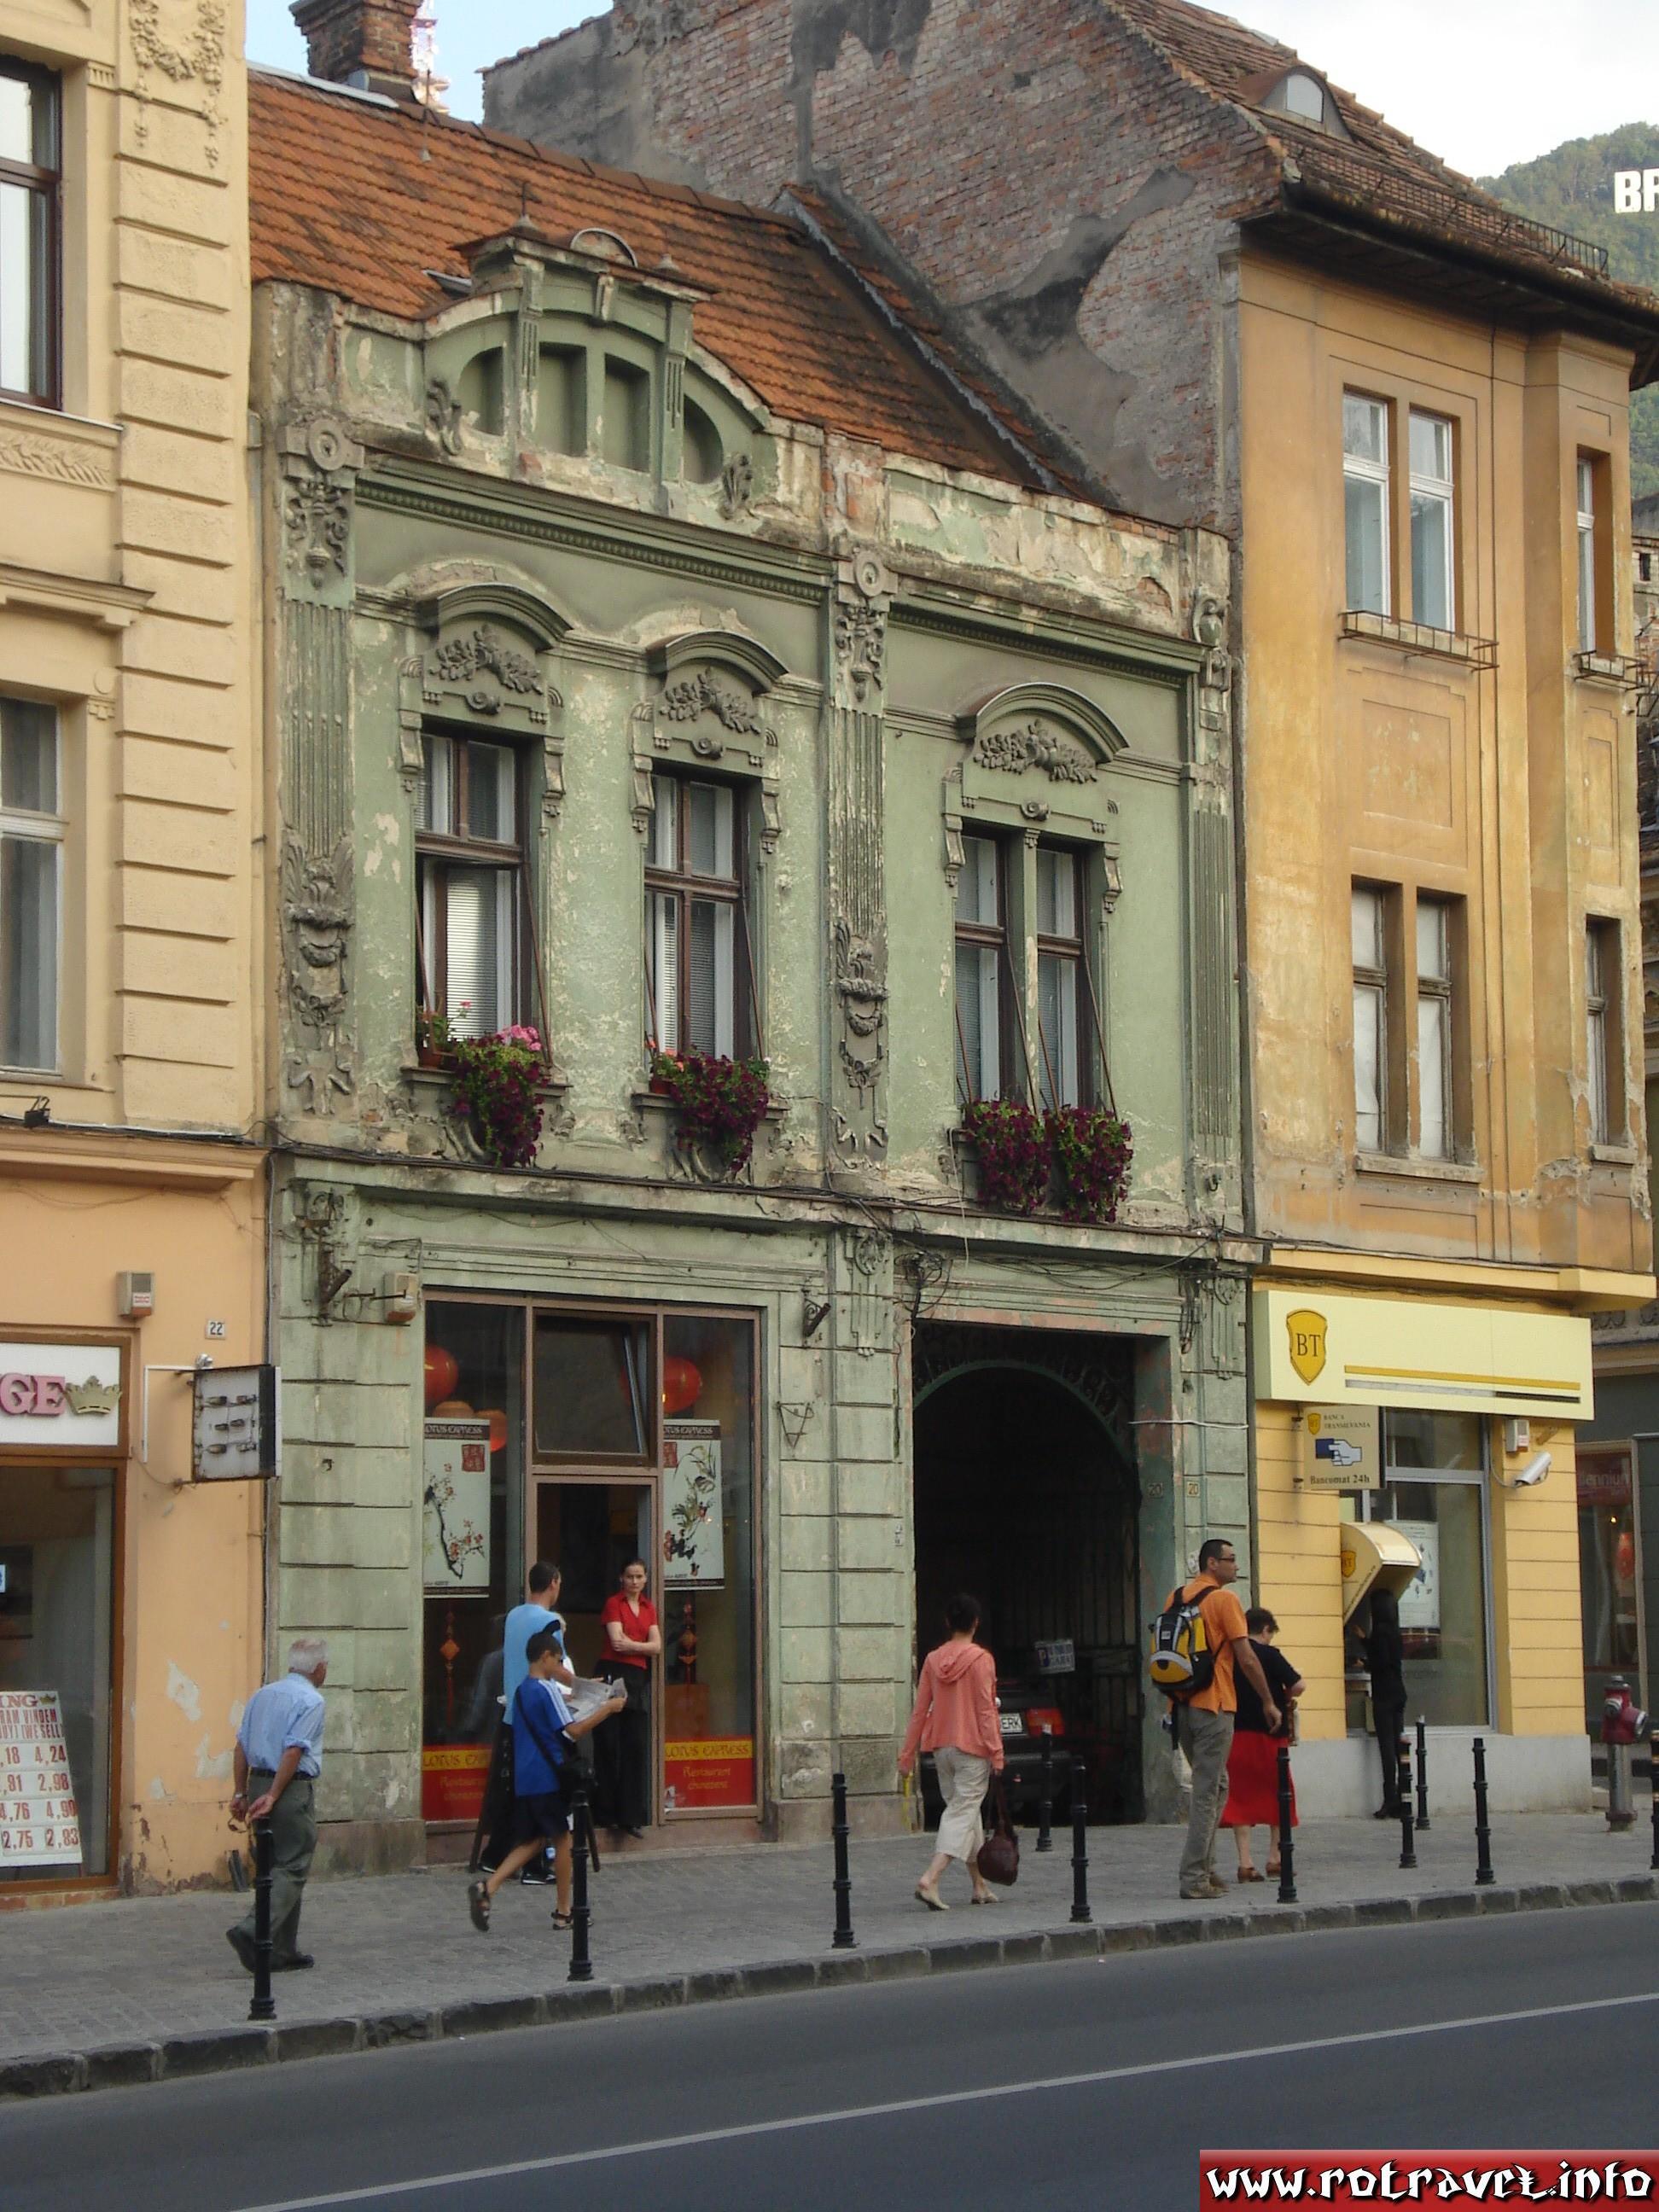 An old building near to the Council Square (Piaţa Sfatului)